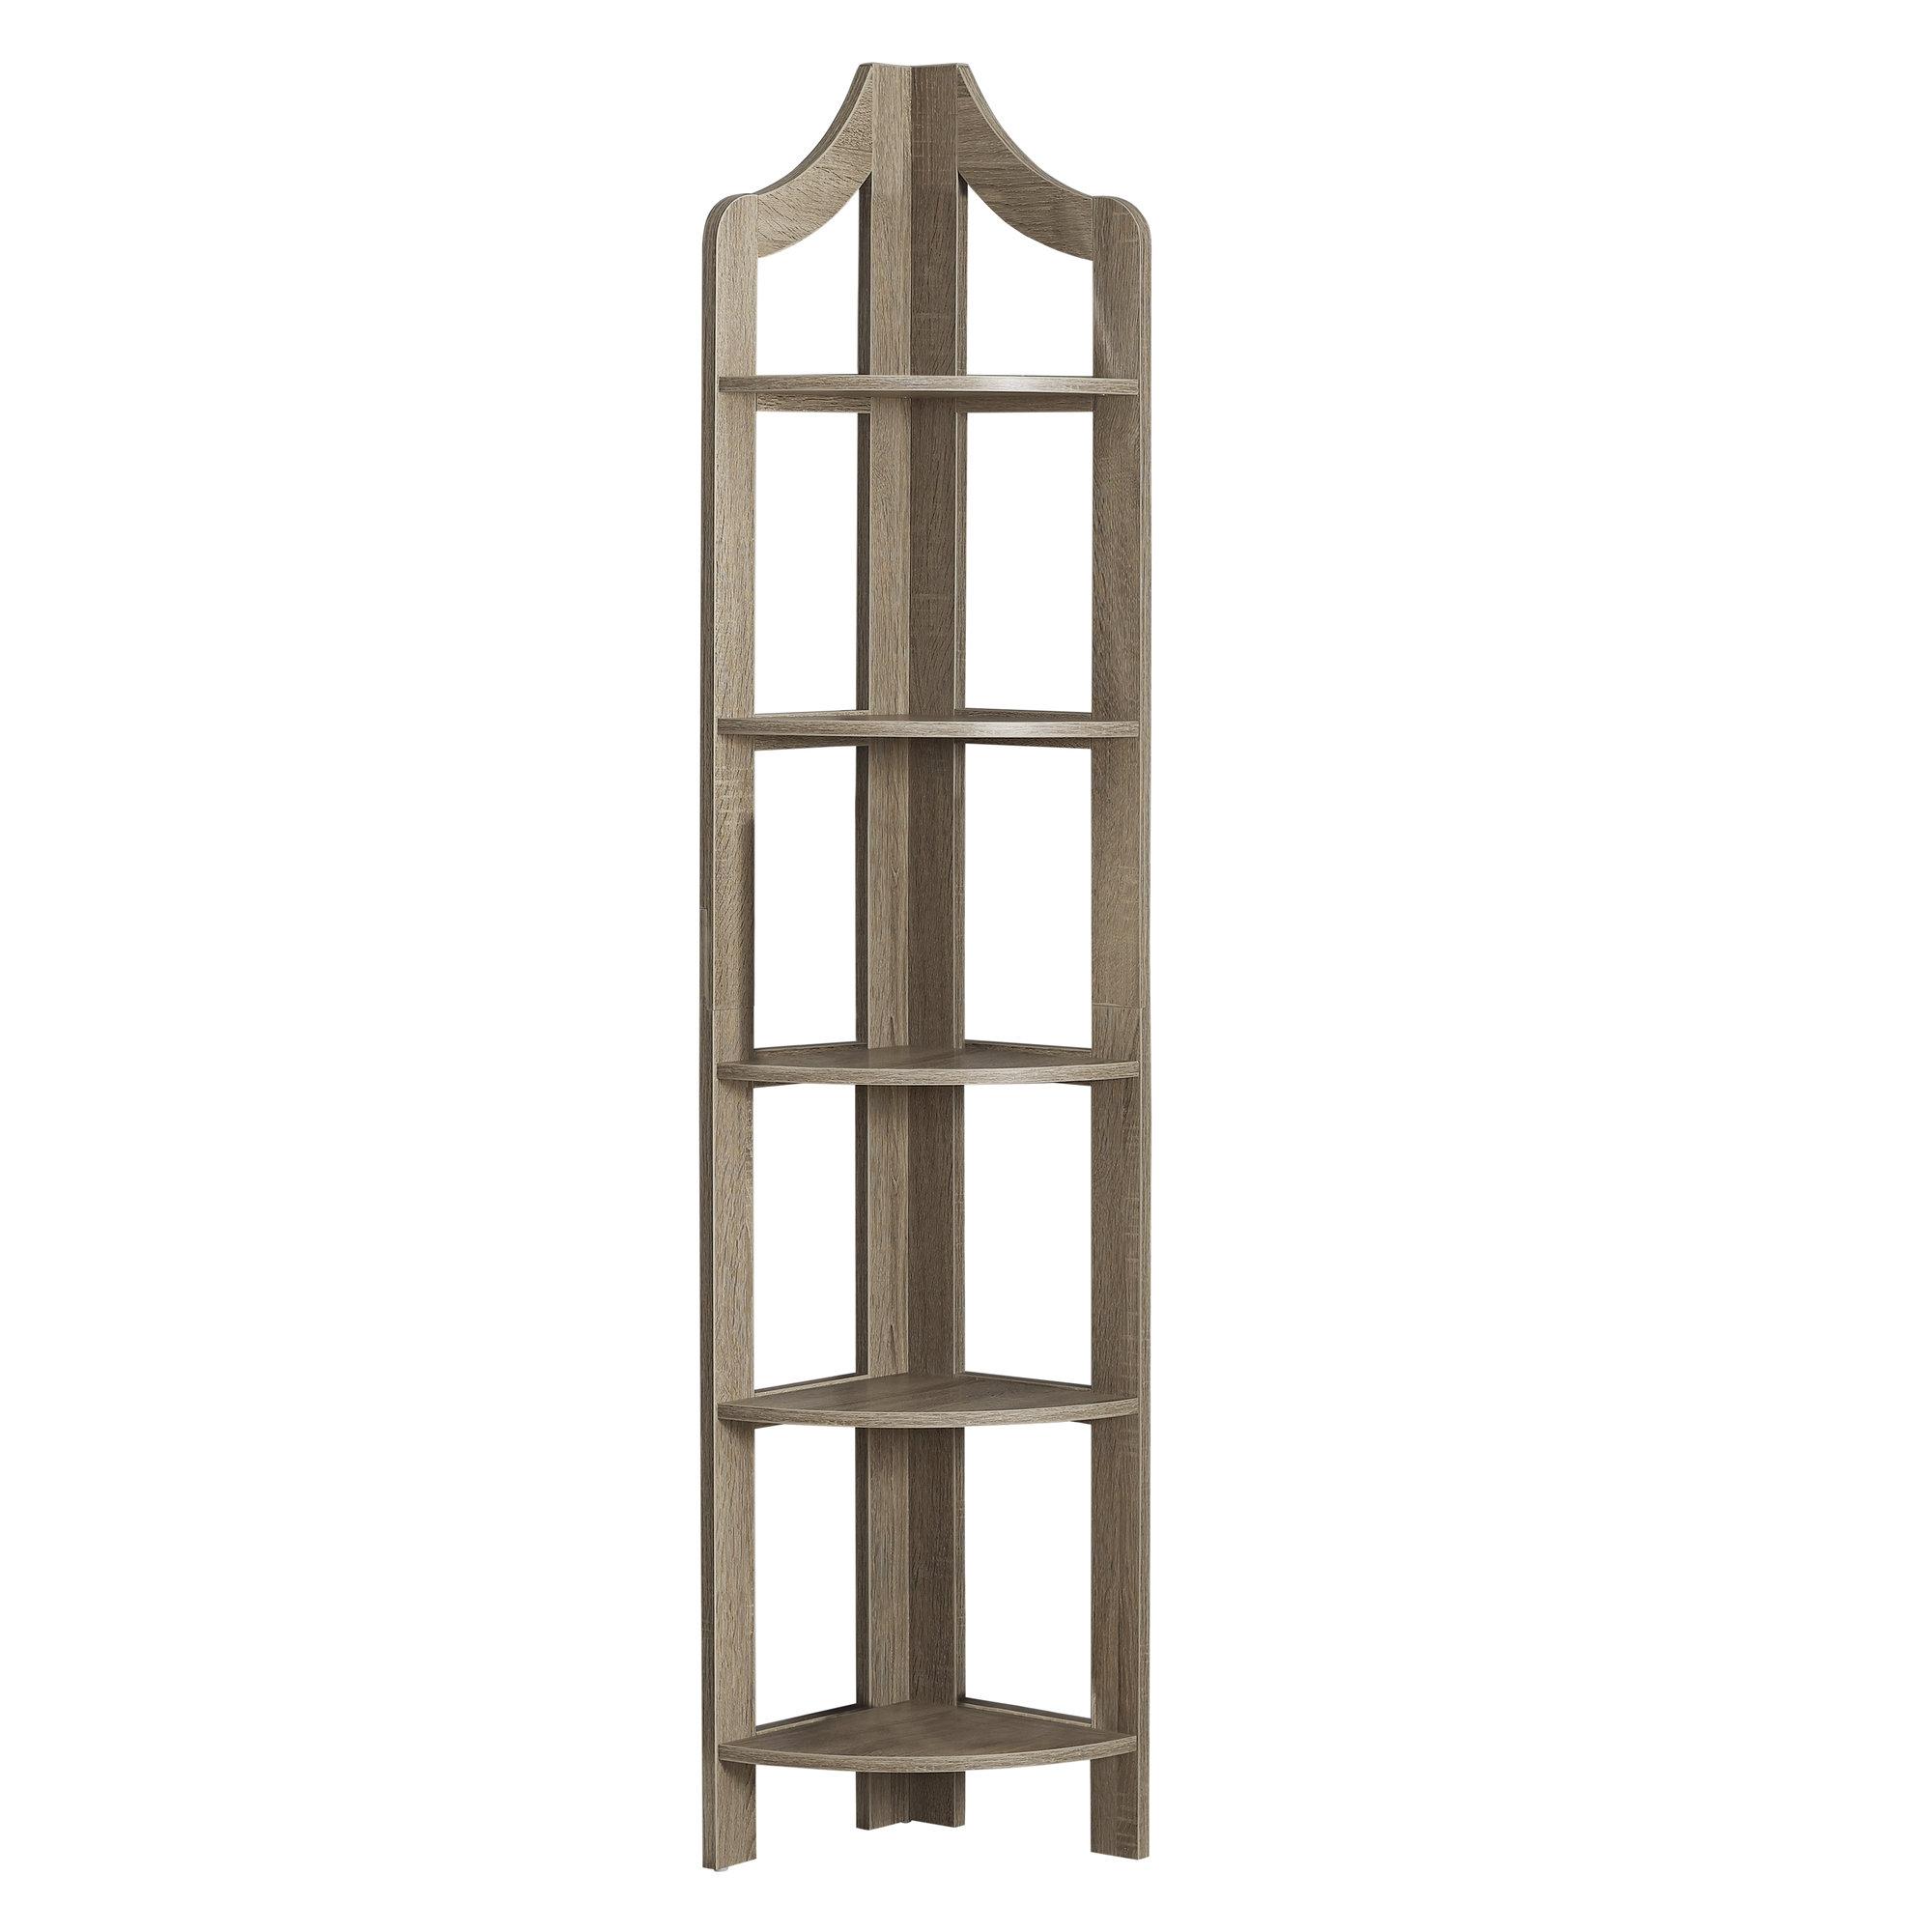 "12.25"" x 17.5"" x 71"" Dark Taupe Particle Board Corner Accent Shelf  Bookcase"